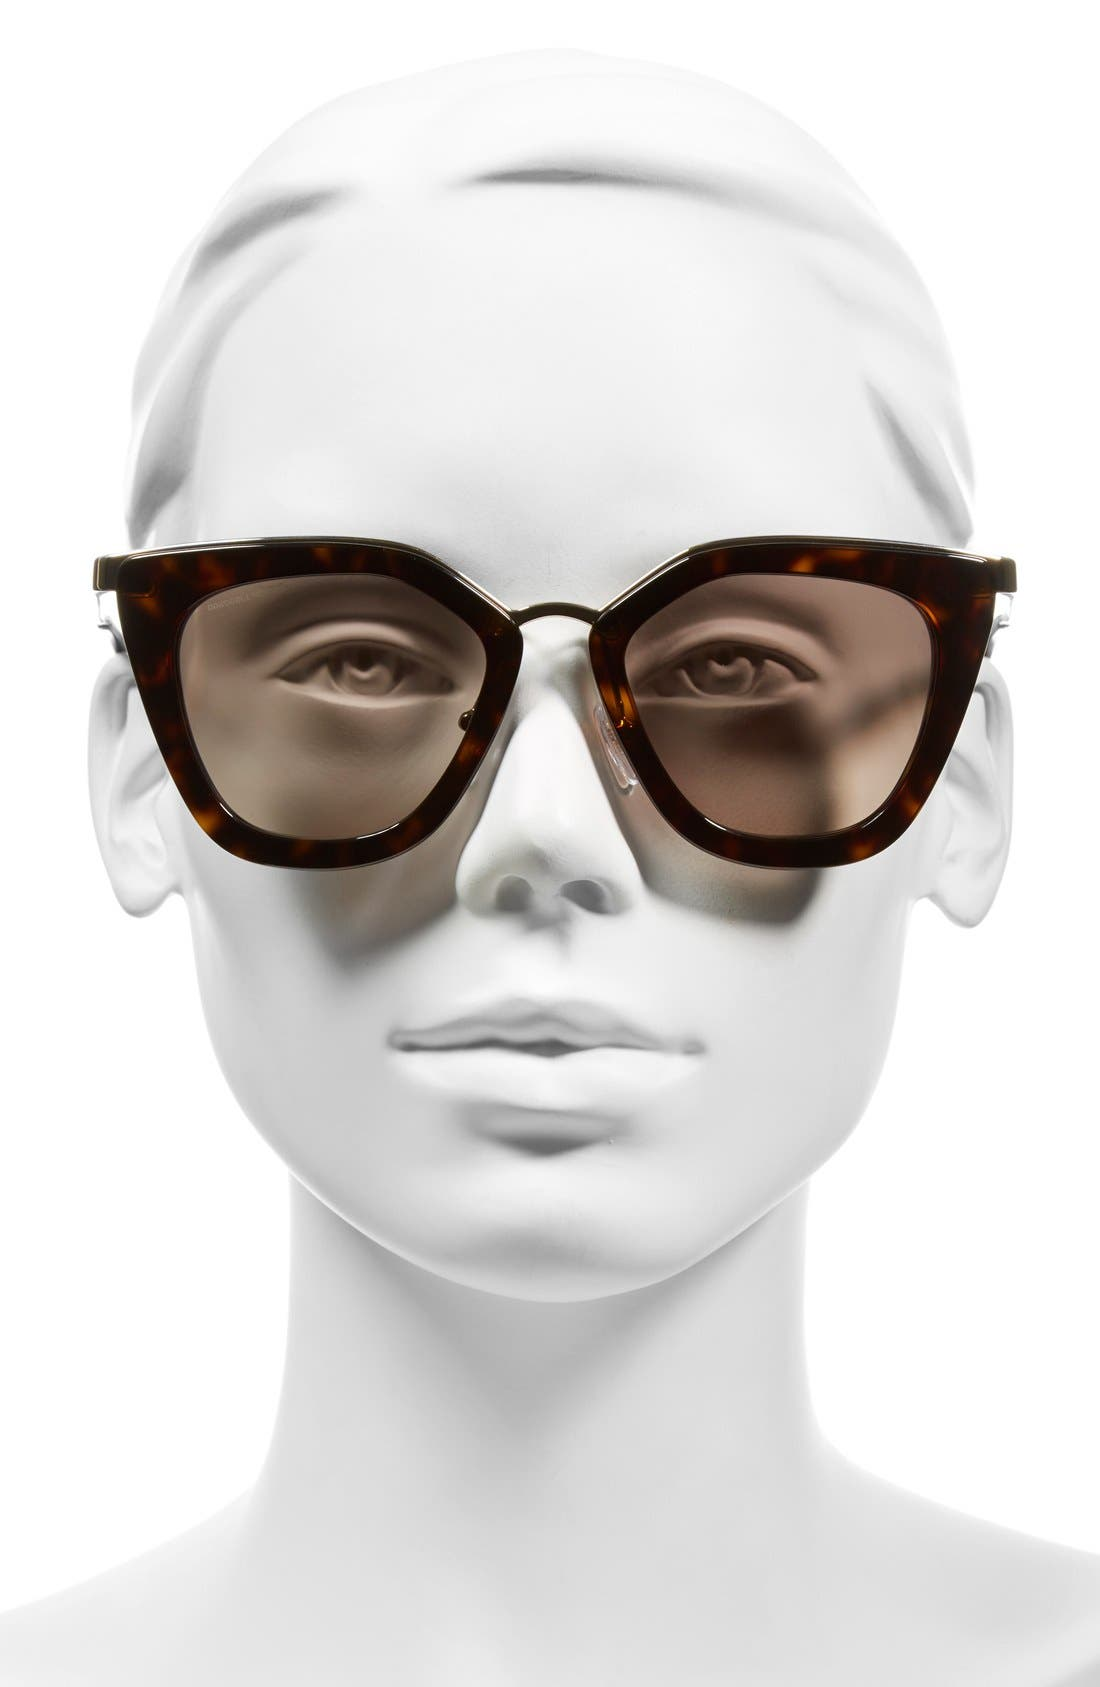 52mm Cat Eye Sunglasses,                             Alternate thumbnail 8, color,